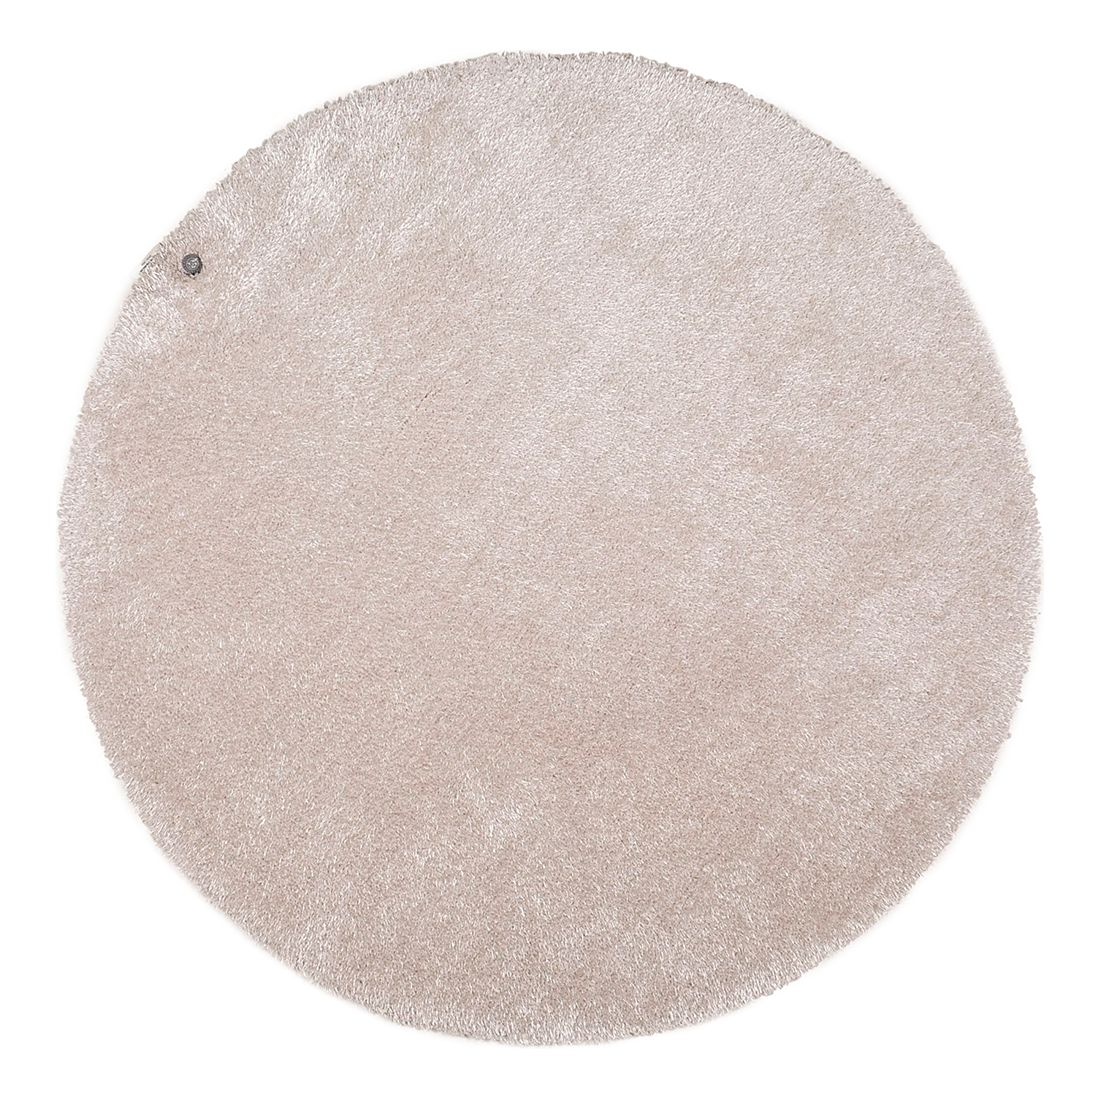 Image of Tappeto Soft Round - Beige - Misure: 140 x 140 cm, Tom Tailor